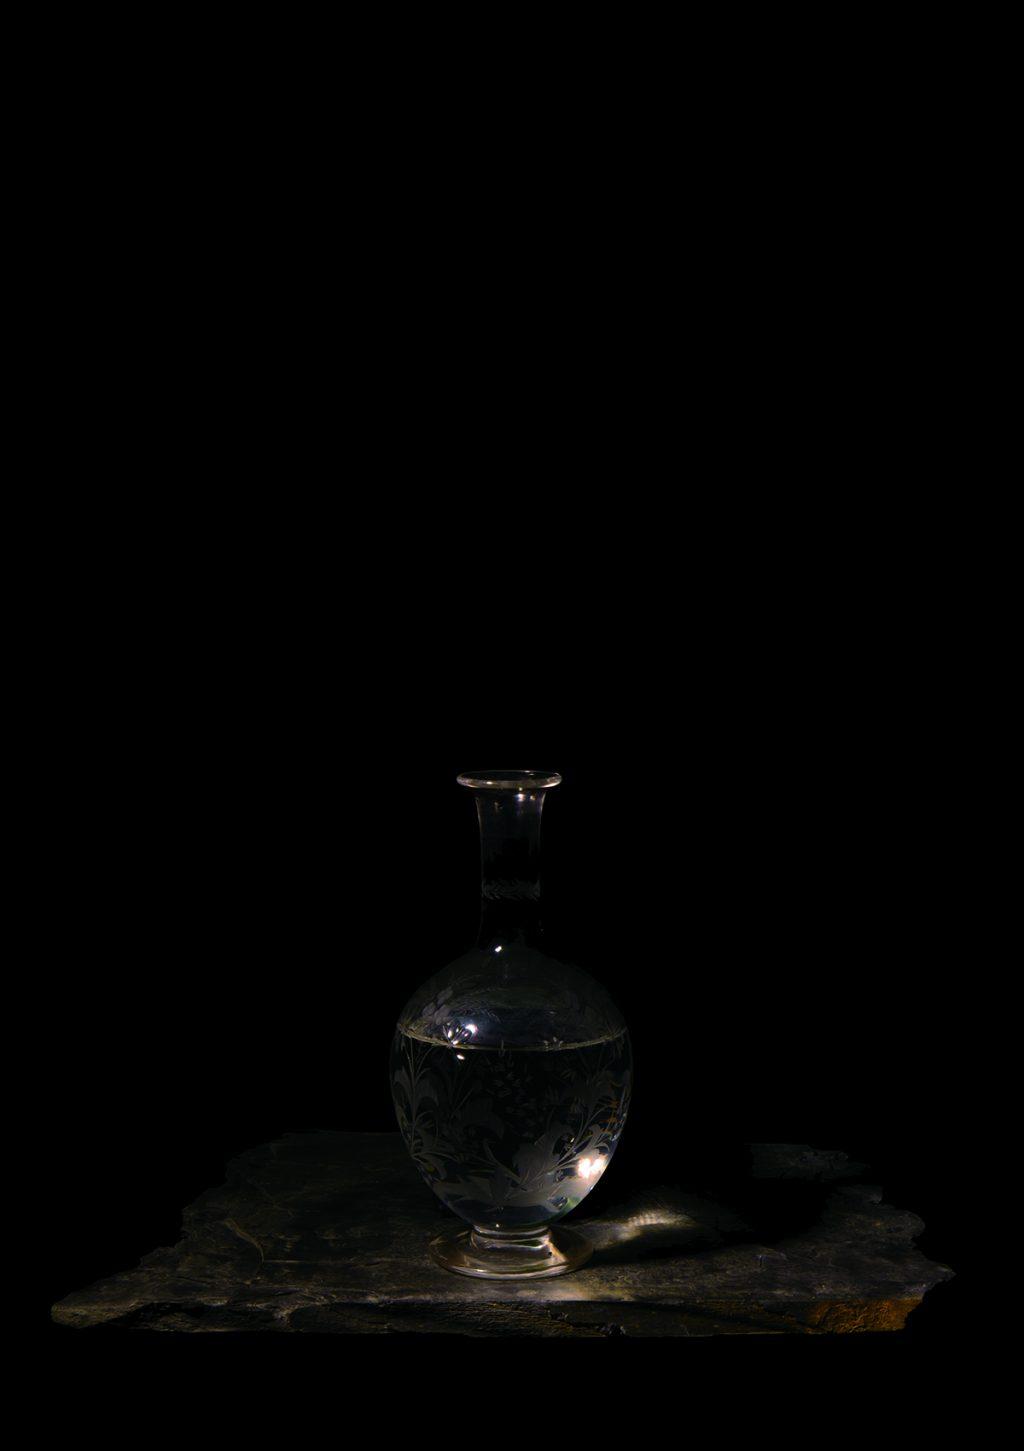 "KOSEMURA Mami 小瀬村真美 ""Guisse"" 2018, Giclee print, Museum glass frame, 65 x 44.5 cm, edition work"